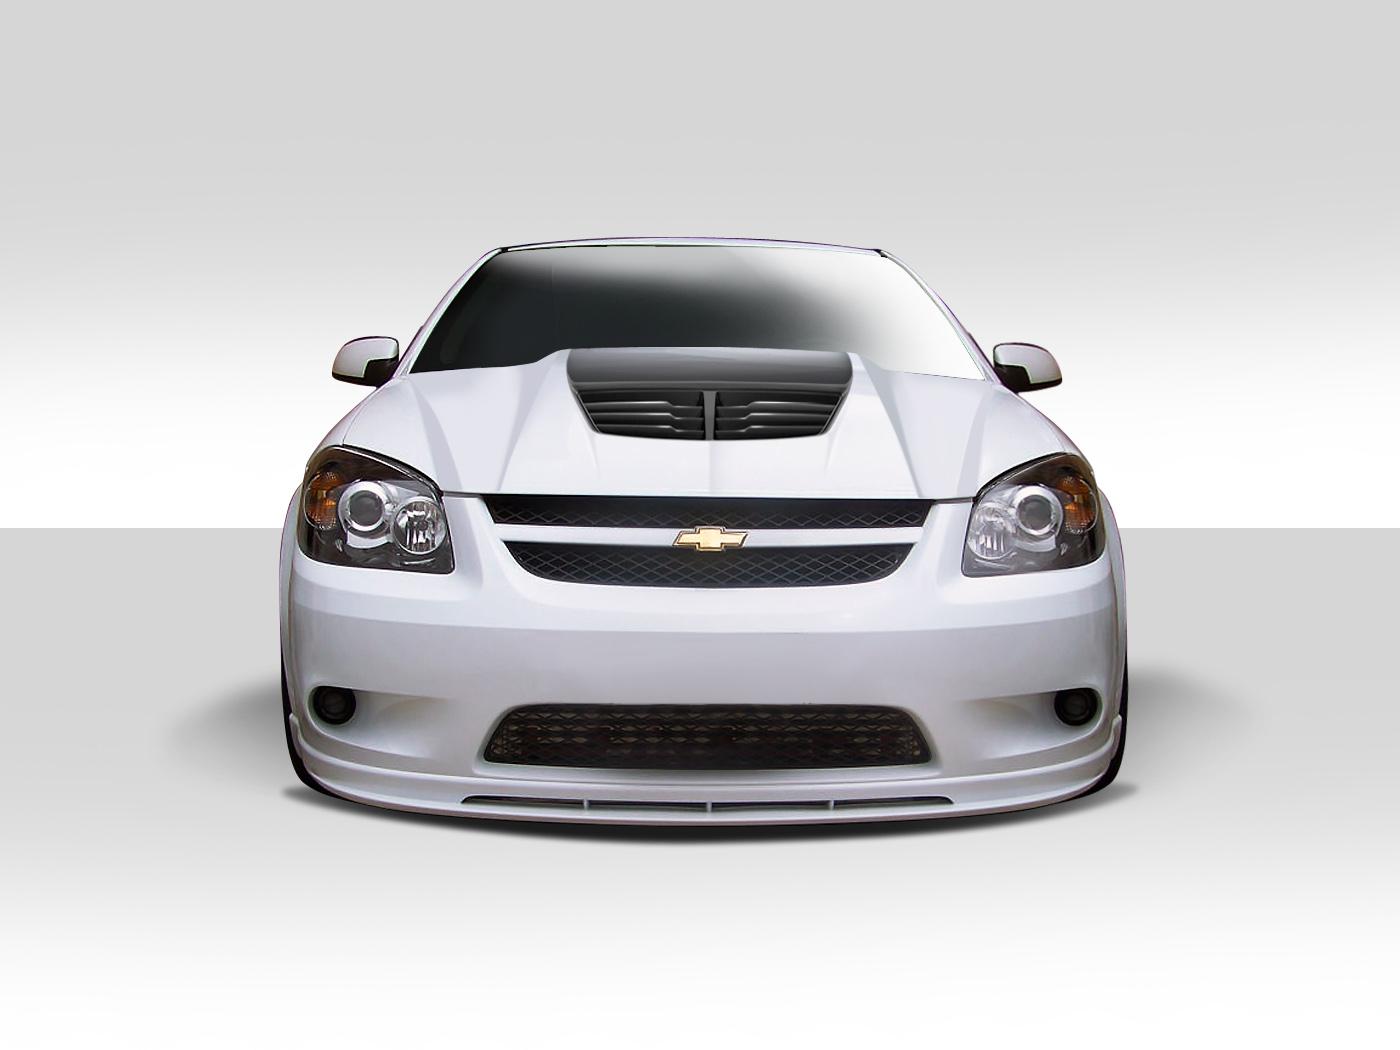 Garage-Pro Hood for CHEVROLET COBALT 2005-2010//G5 2007-2009